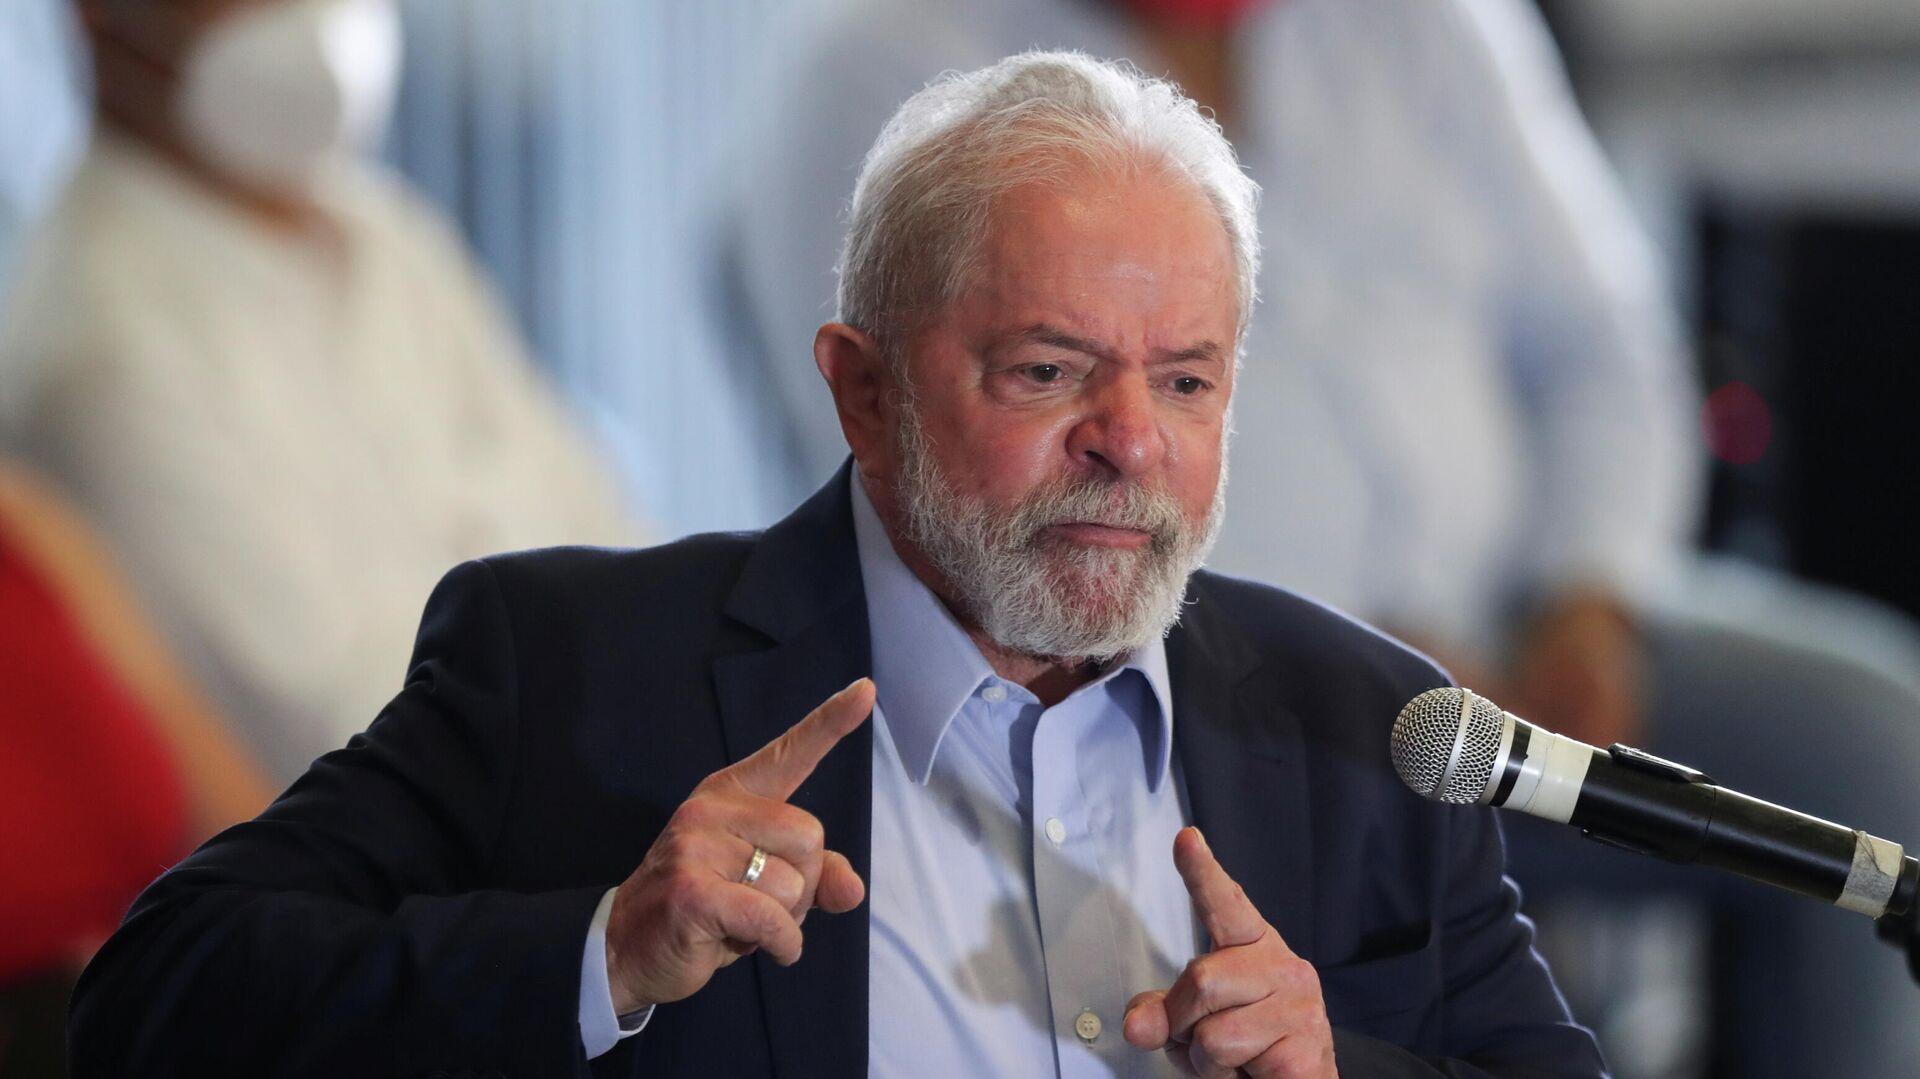 El expresidente brasileño Luiz Inácio Lula da Silva - Sputnik Mundo, 1920, 12.03.2021